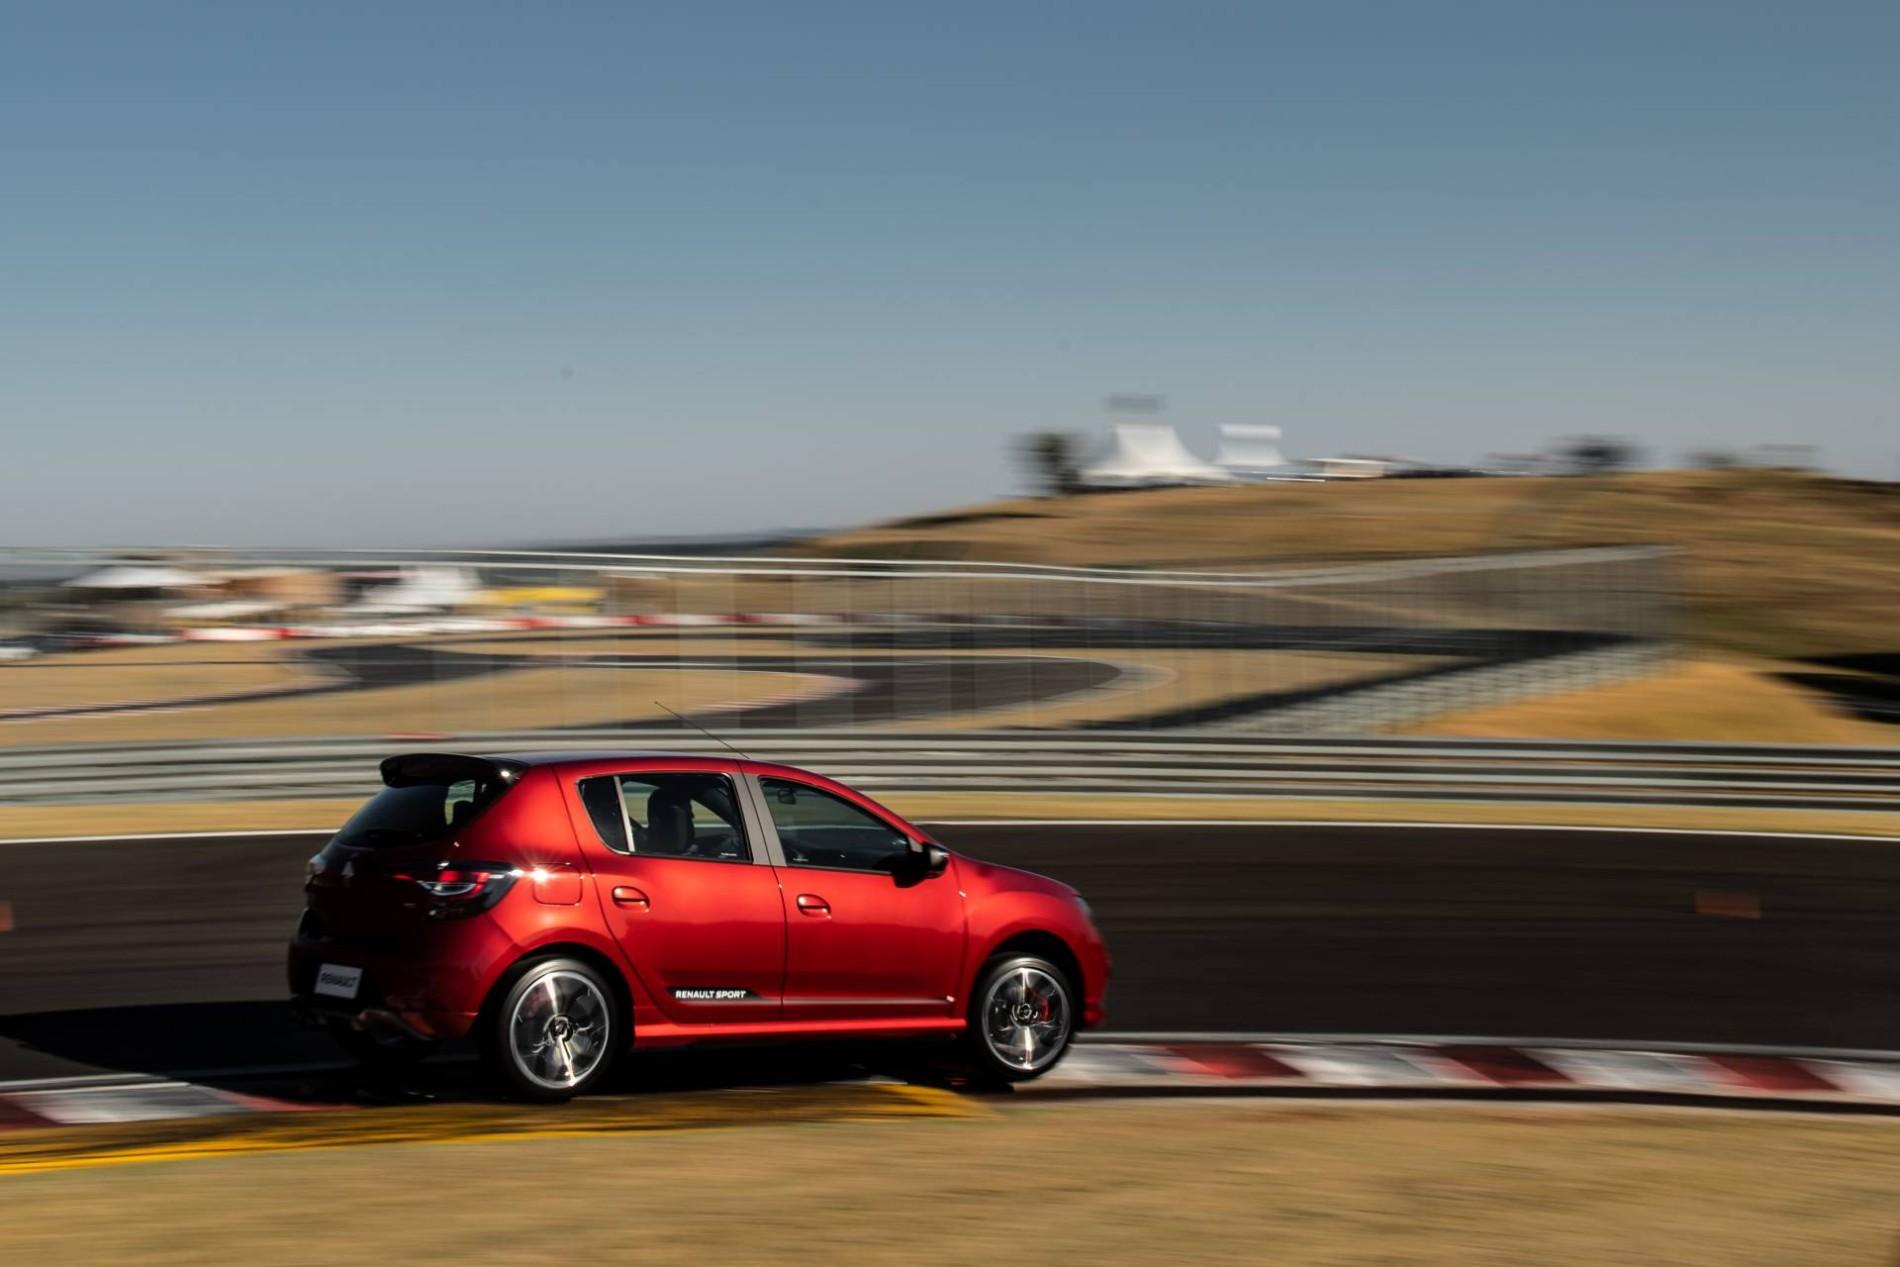 Renault Sandero RS Facelift - Renault Sandero RS Facelift